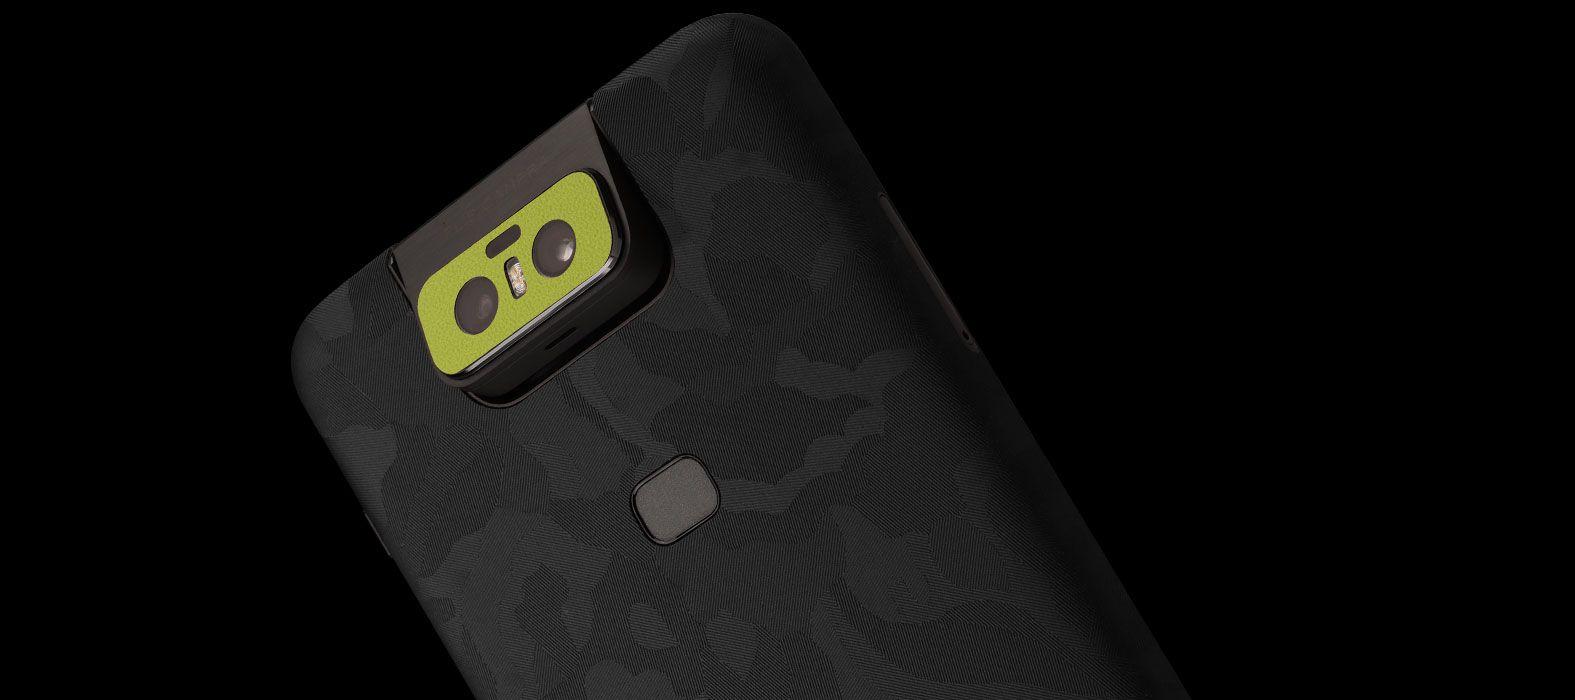 Asus-Zenfone-6Z-Black-Camo-Skins